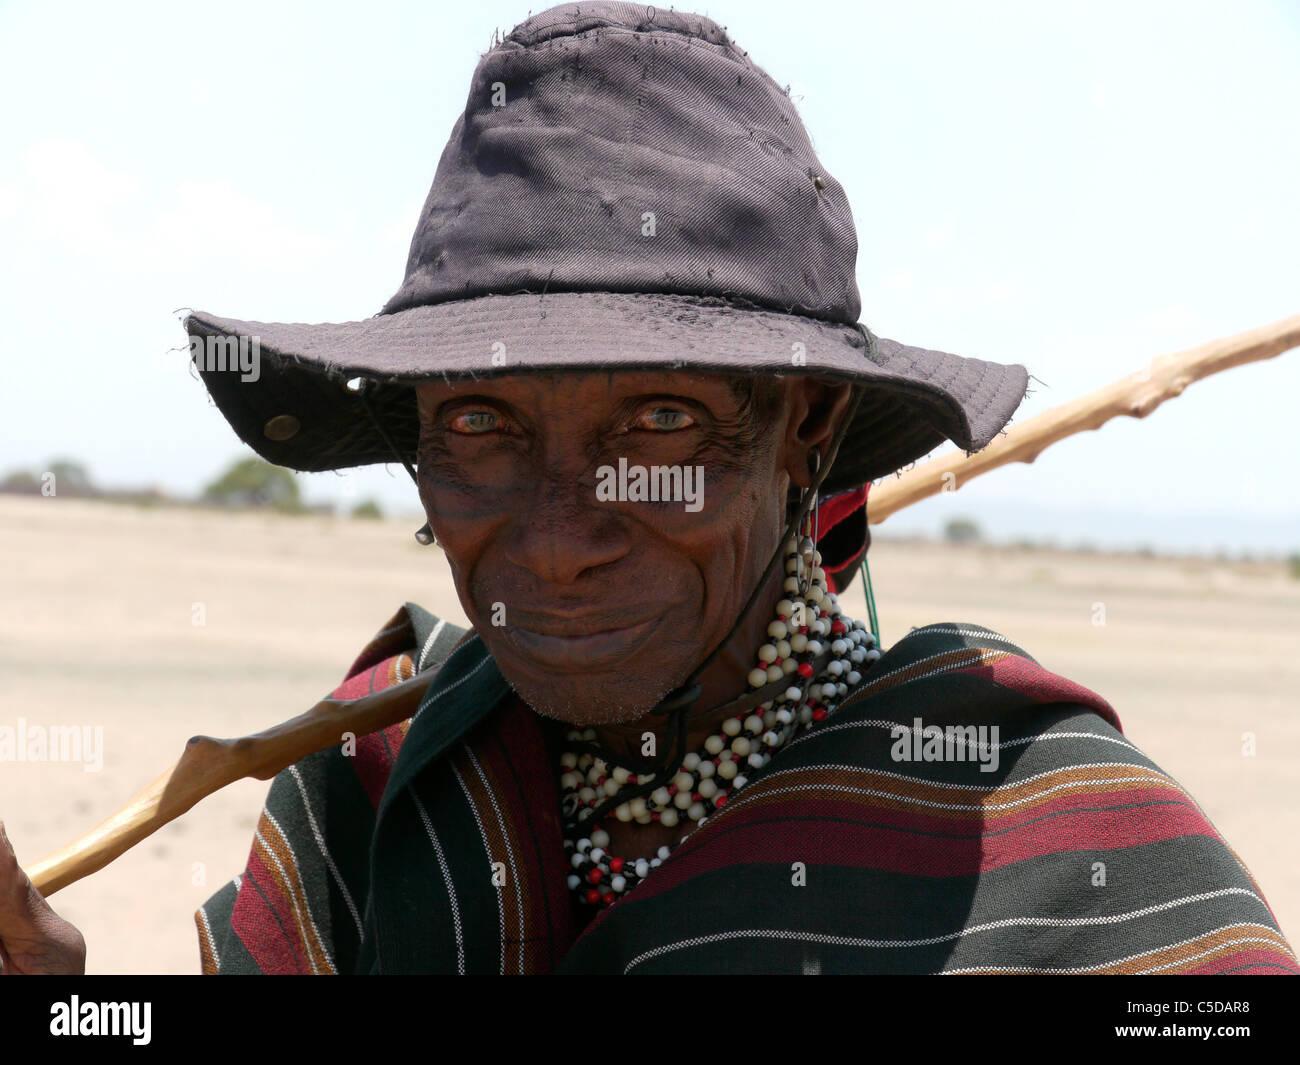 TANZANIA Watatulu tribesmen of Miyuguyu, Shinyanga district. Old man. photograph by Sean Sprague Stock Photo